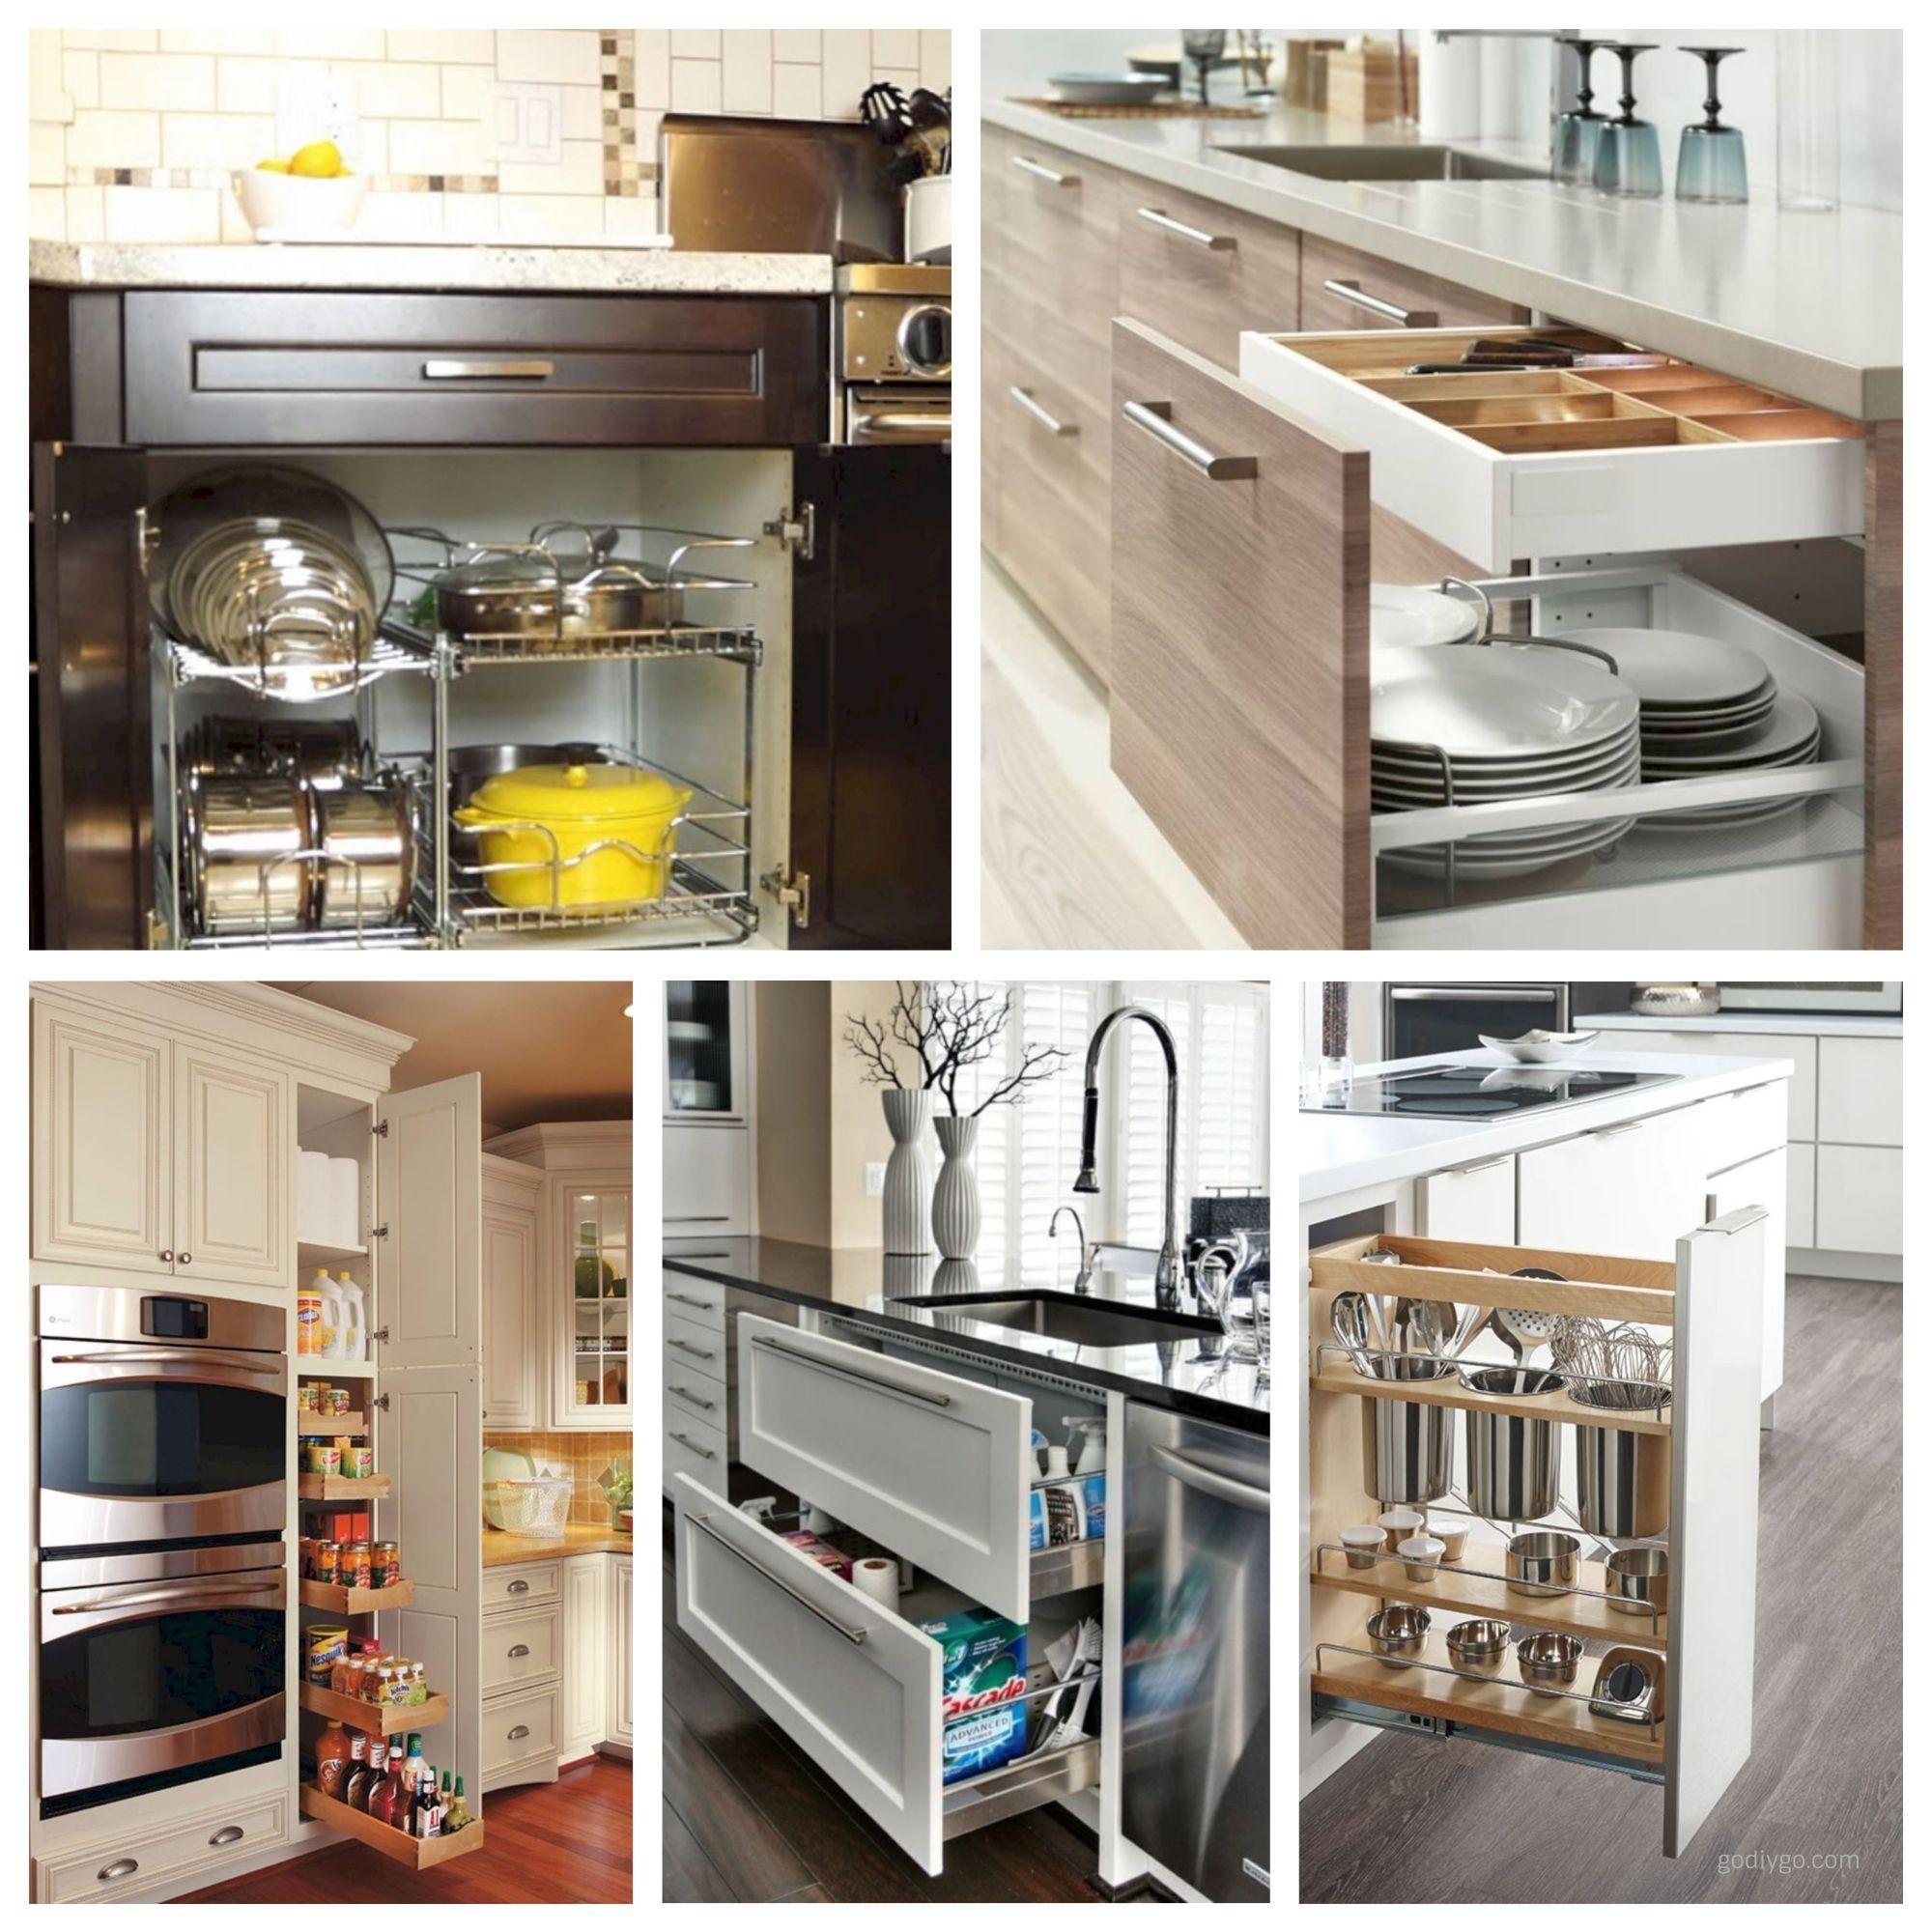 44 Smart Kitchen Cabinet Organization Ideas Godiygo Com Smart Kitchen Apartment Kitchen Organization Small Kitchen Cabinets